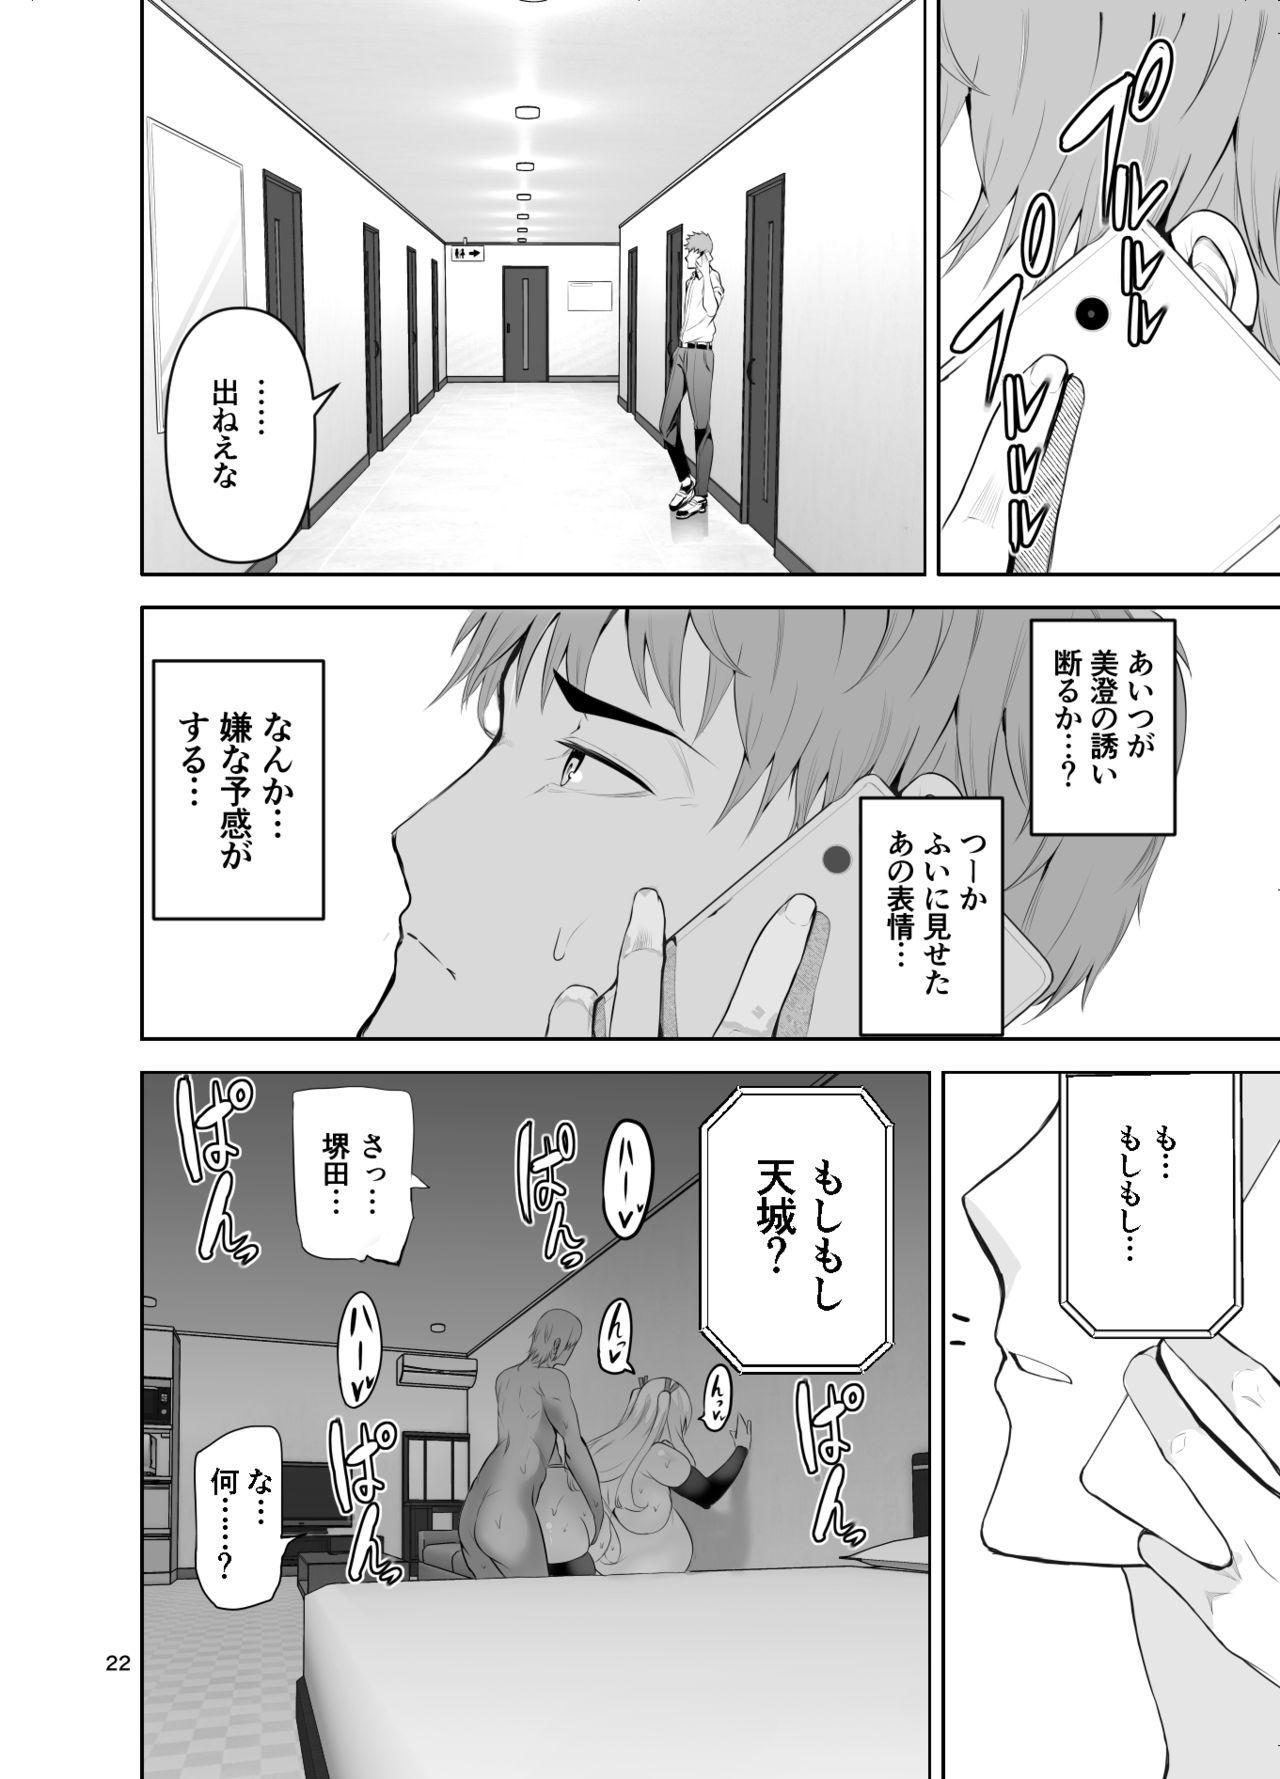 [Wakuseiburo (cup-chan)] TS Musume Kodama-chan to H! Sono 4 | TS Girl Kodama-chan and Ecchi! Part 4 [Digital] 22